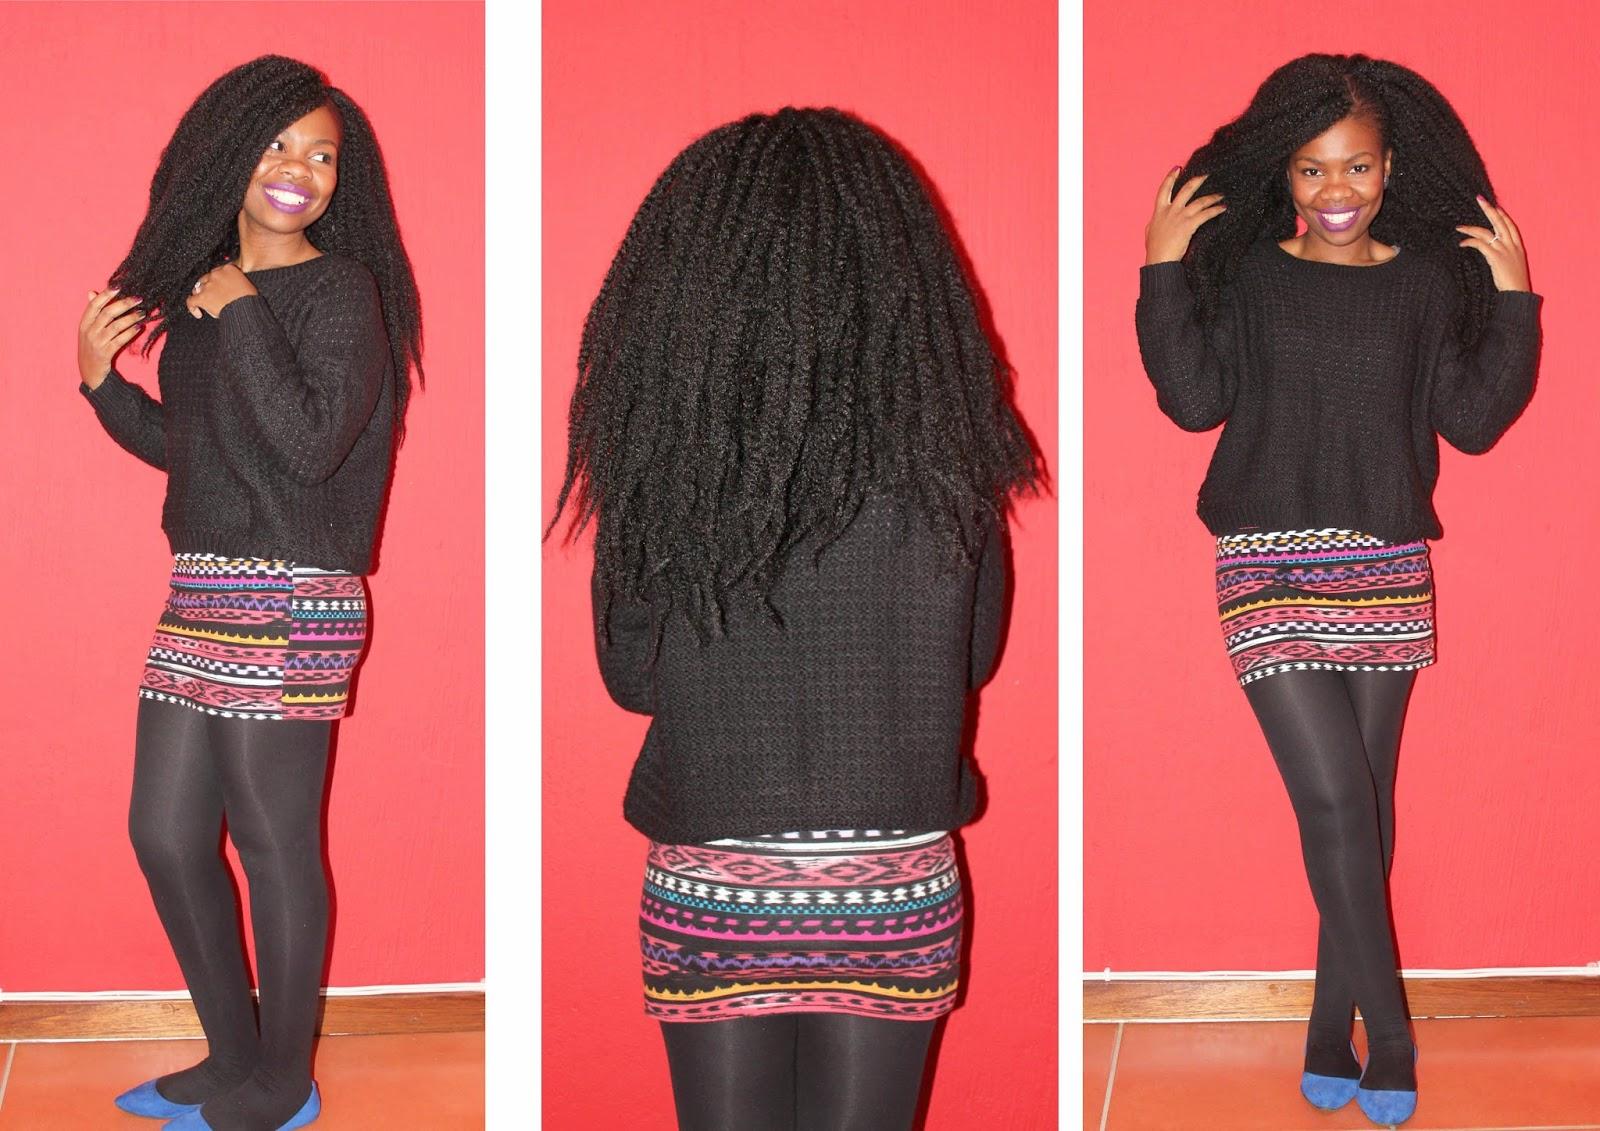 2014 Protective Style 3 Afro Marley Weave Aisha Life